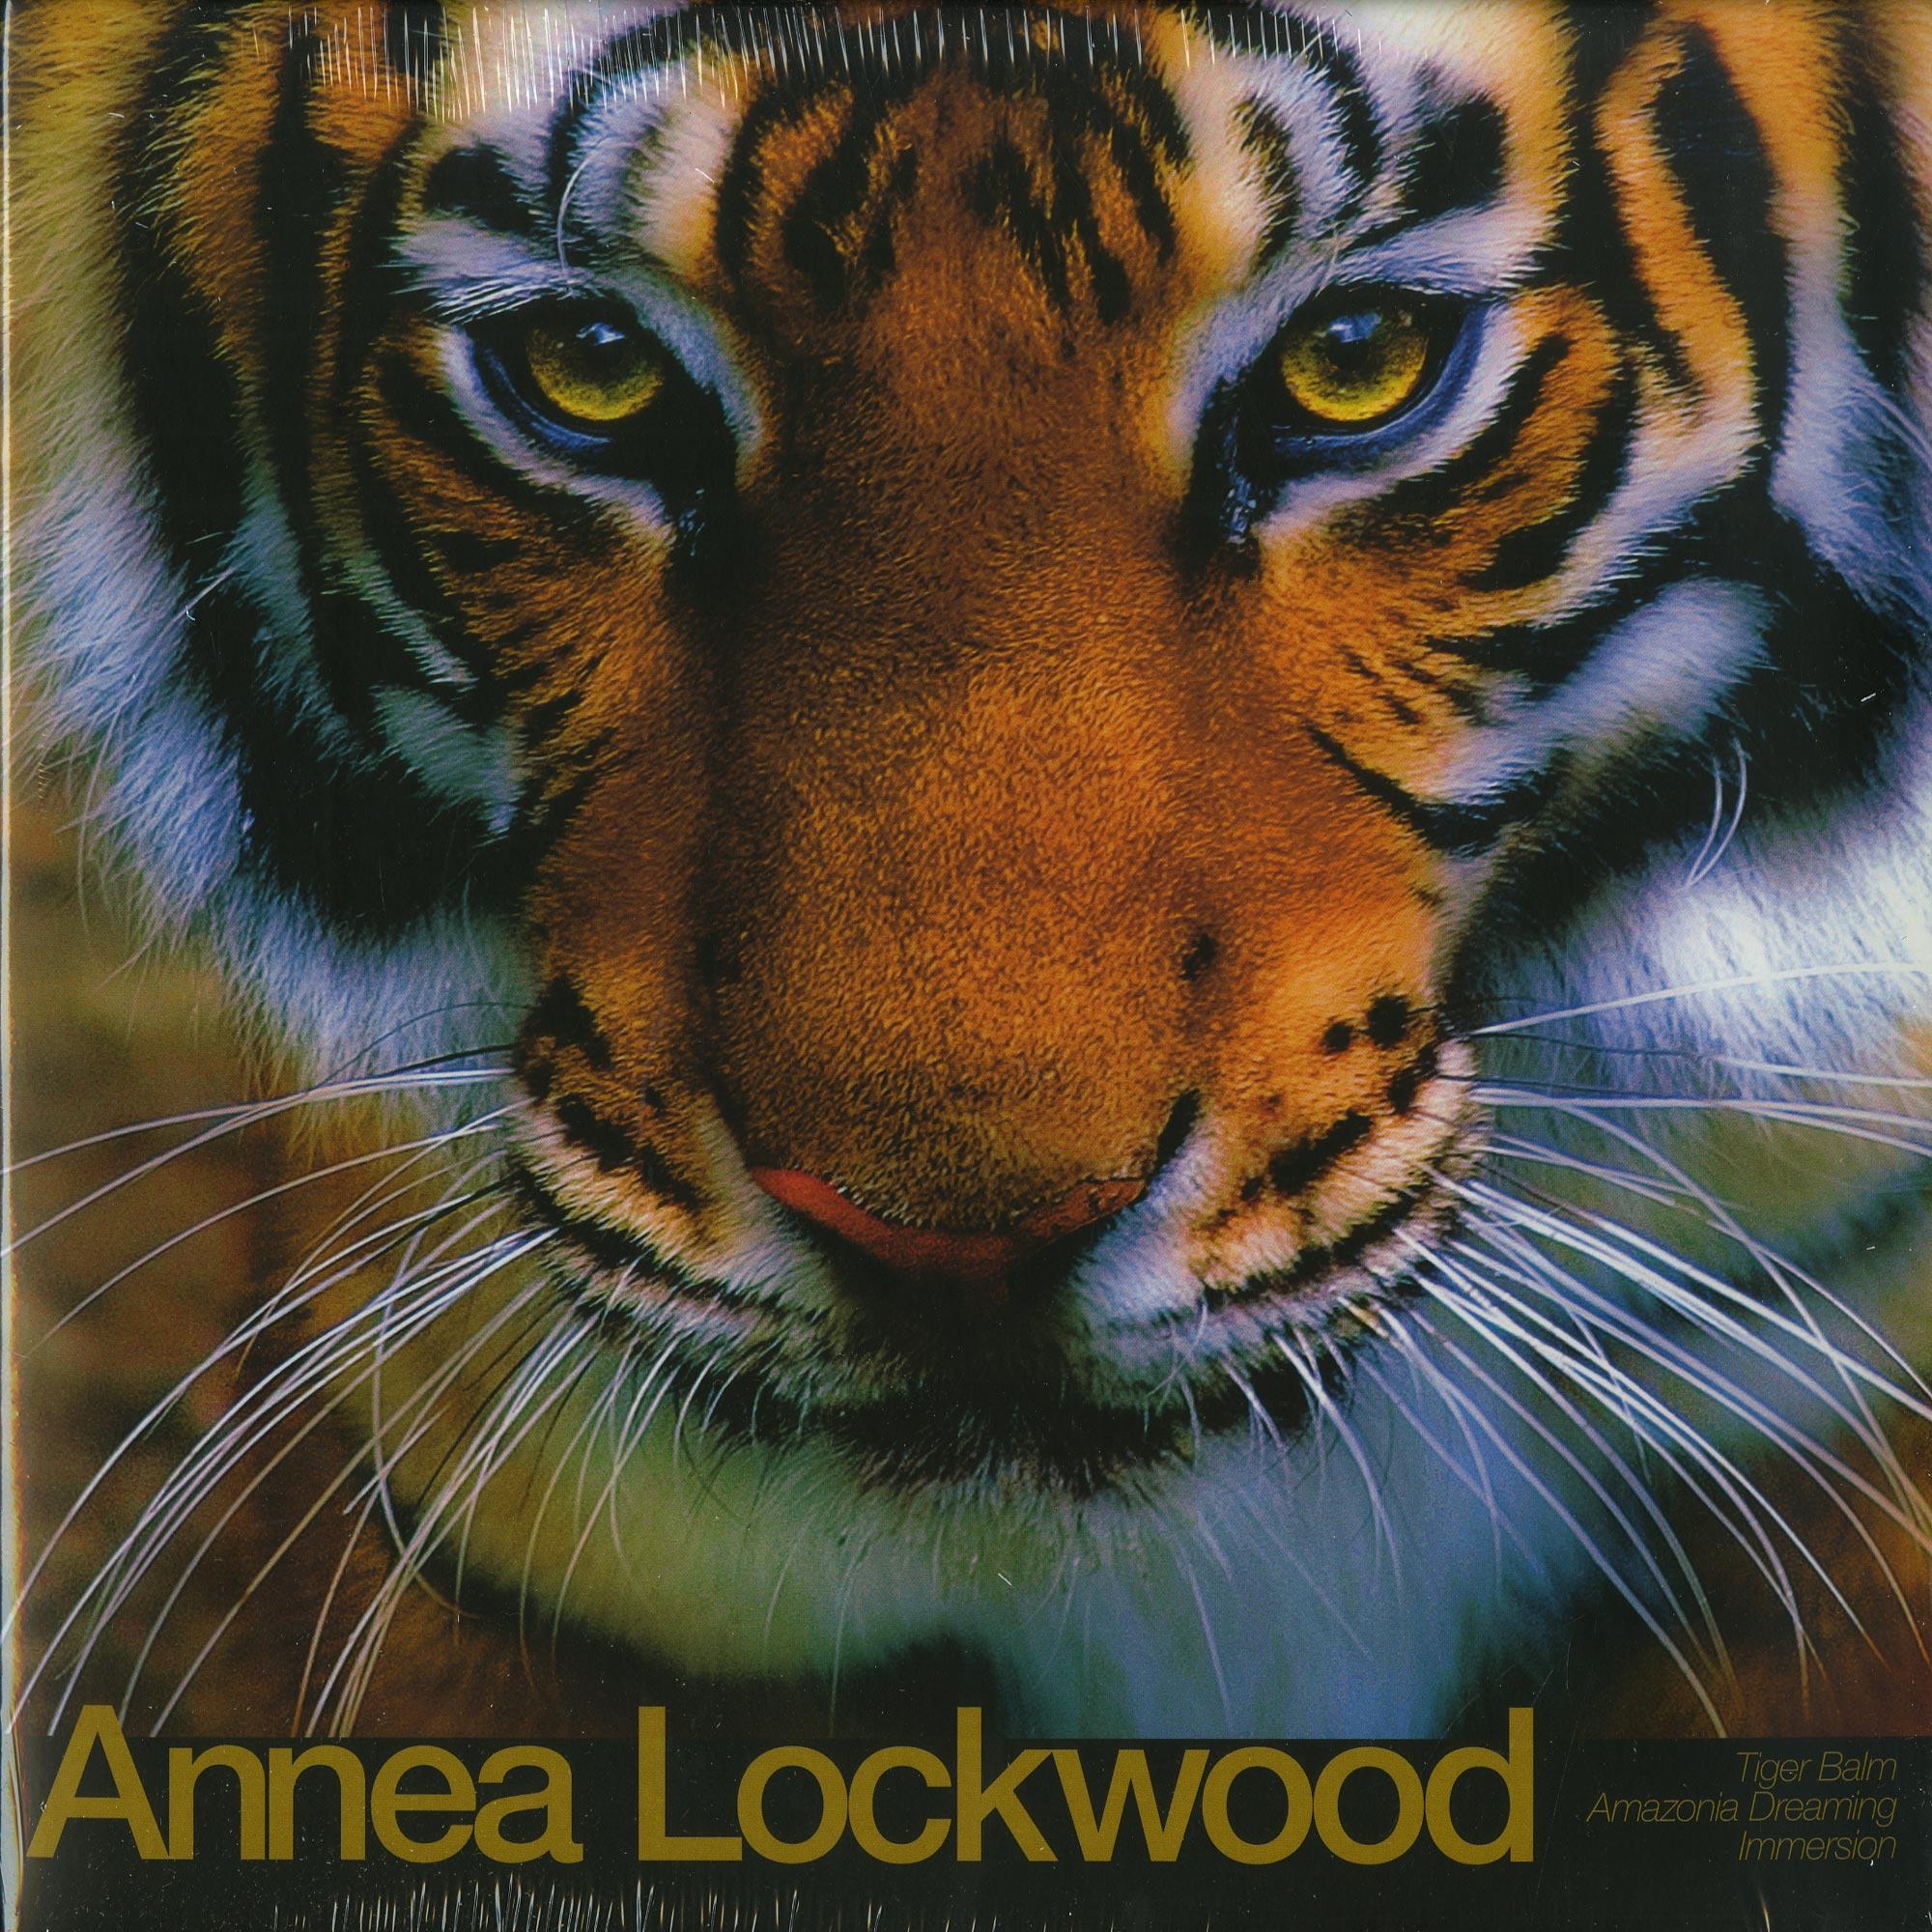 Annea Lockwood - TIGER BALM. AMAZONIA DREAMING. IMMERSION